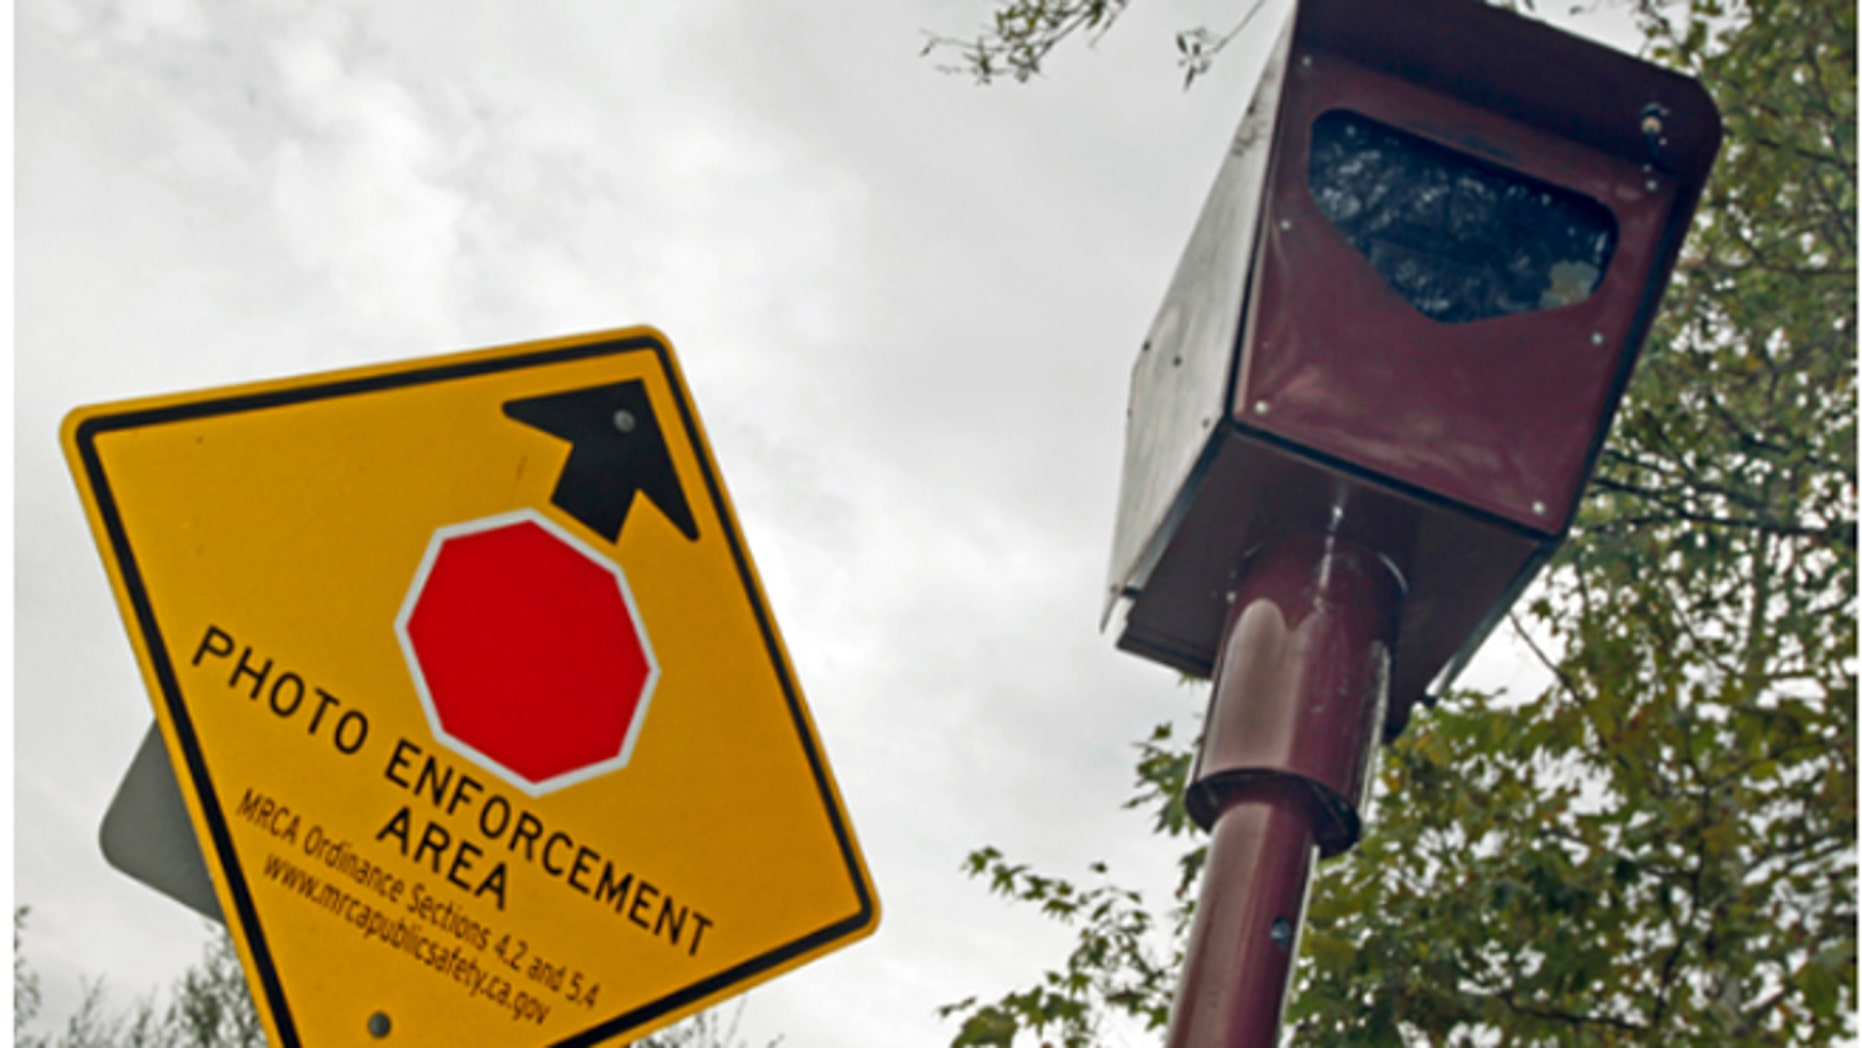 Drivers' newest nemesis -- stop-sign cameras | Fox News